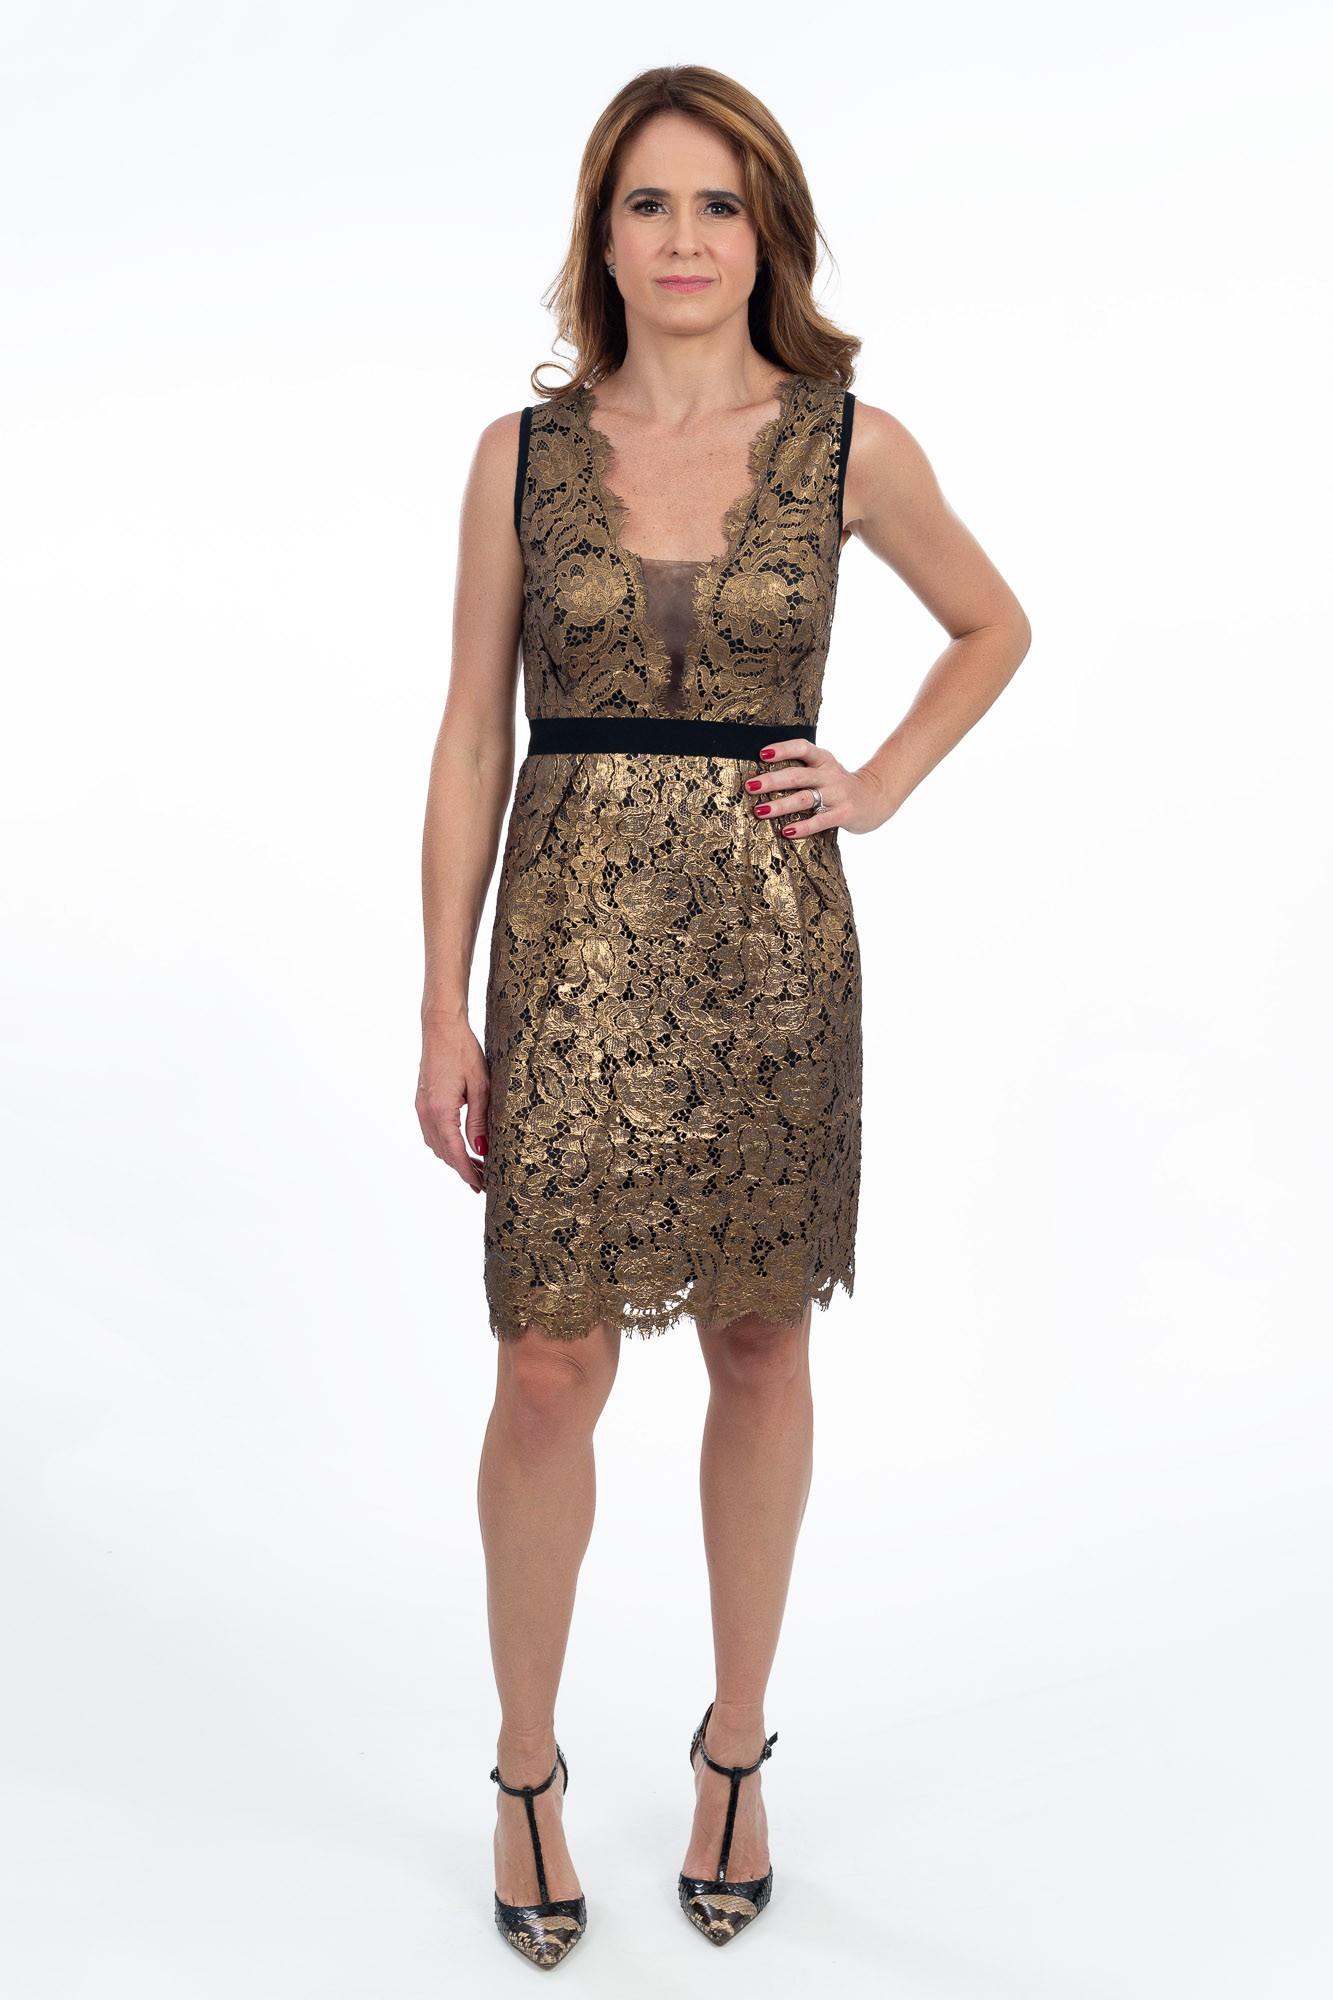 Vestido renda dourado Bárbara Bela Luxo tam 42